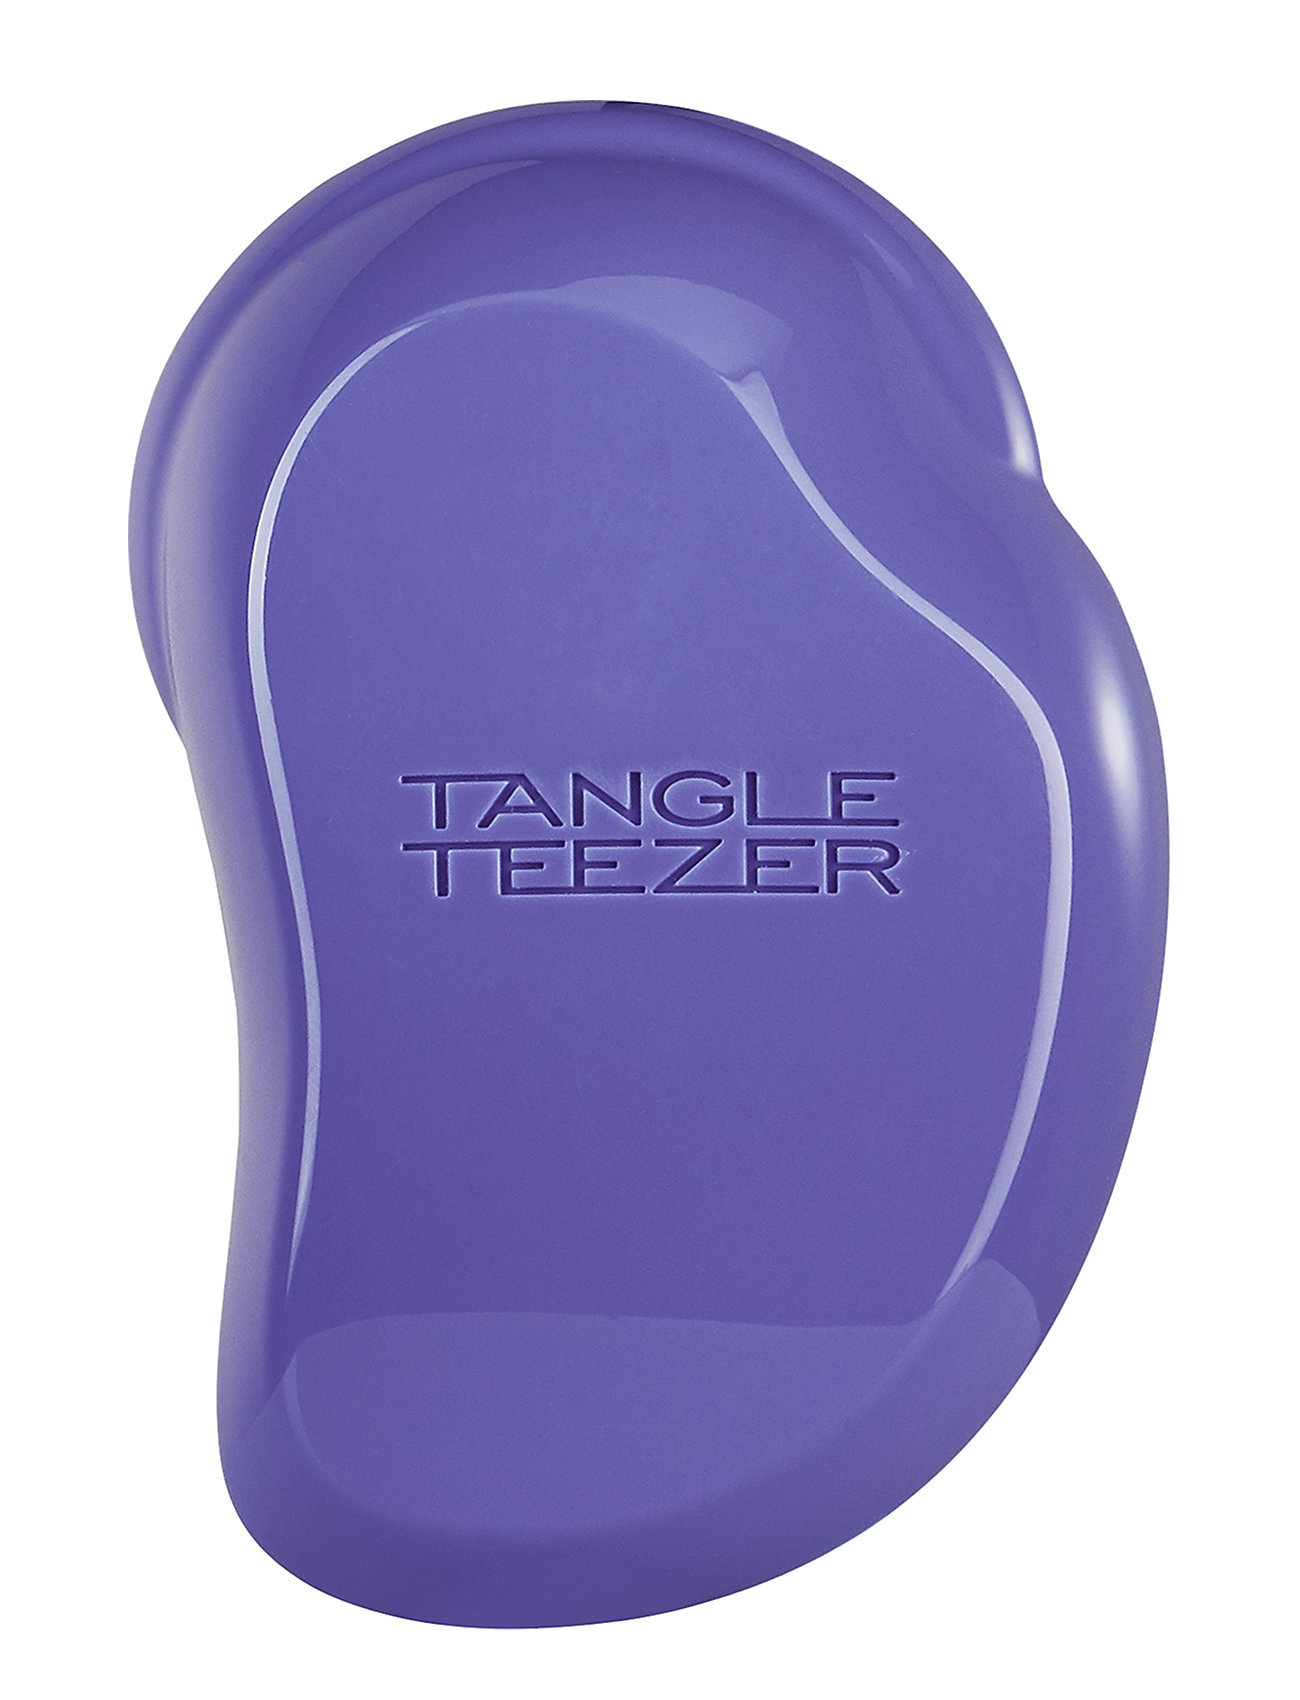 Tangle Teezer Tangle Teezer Original Purple Electric - NO COLOUR